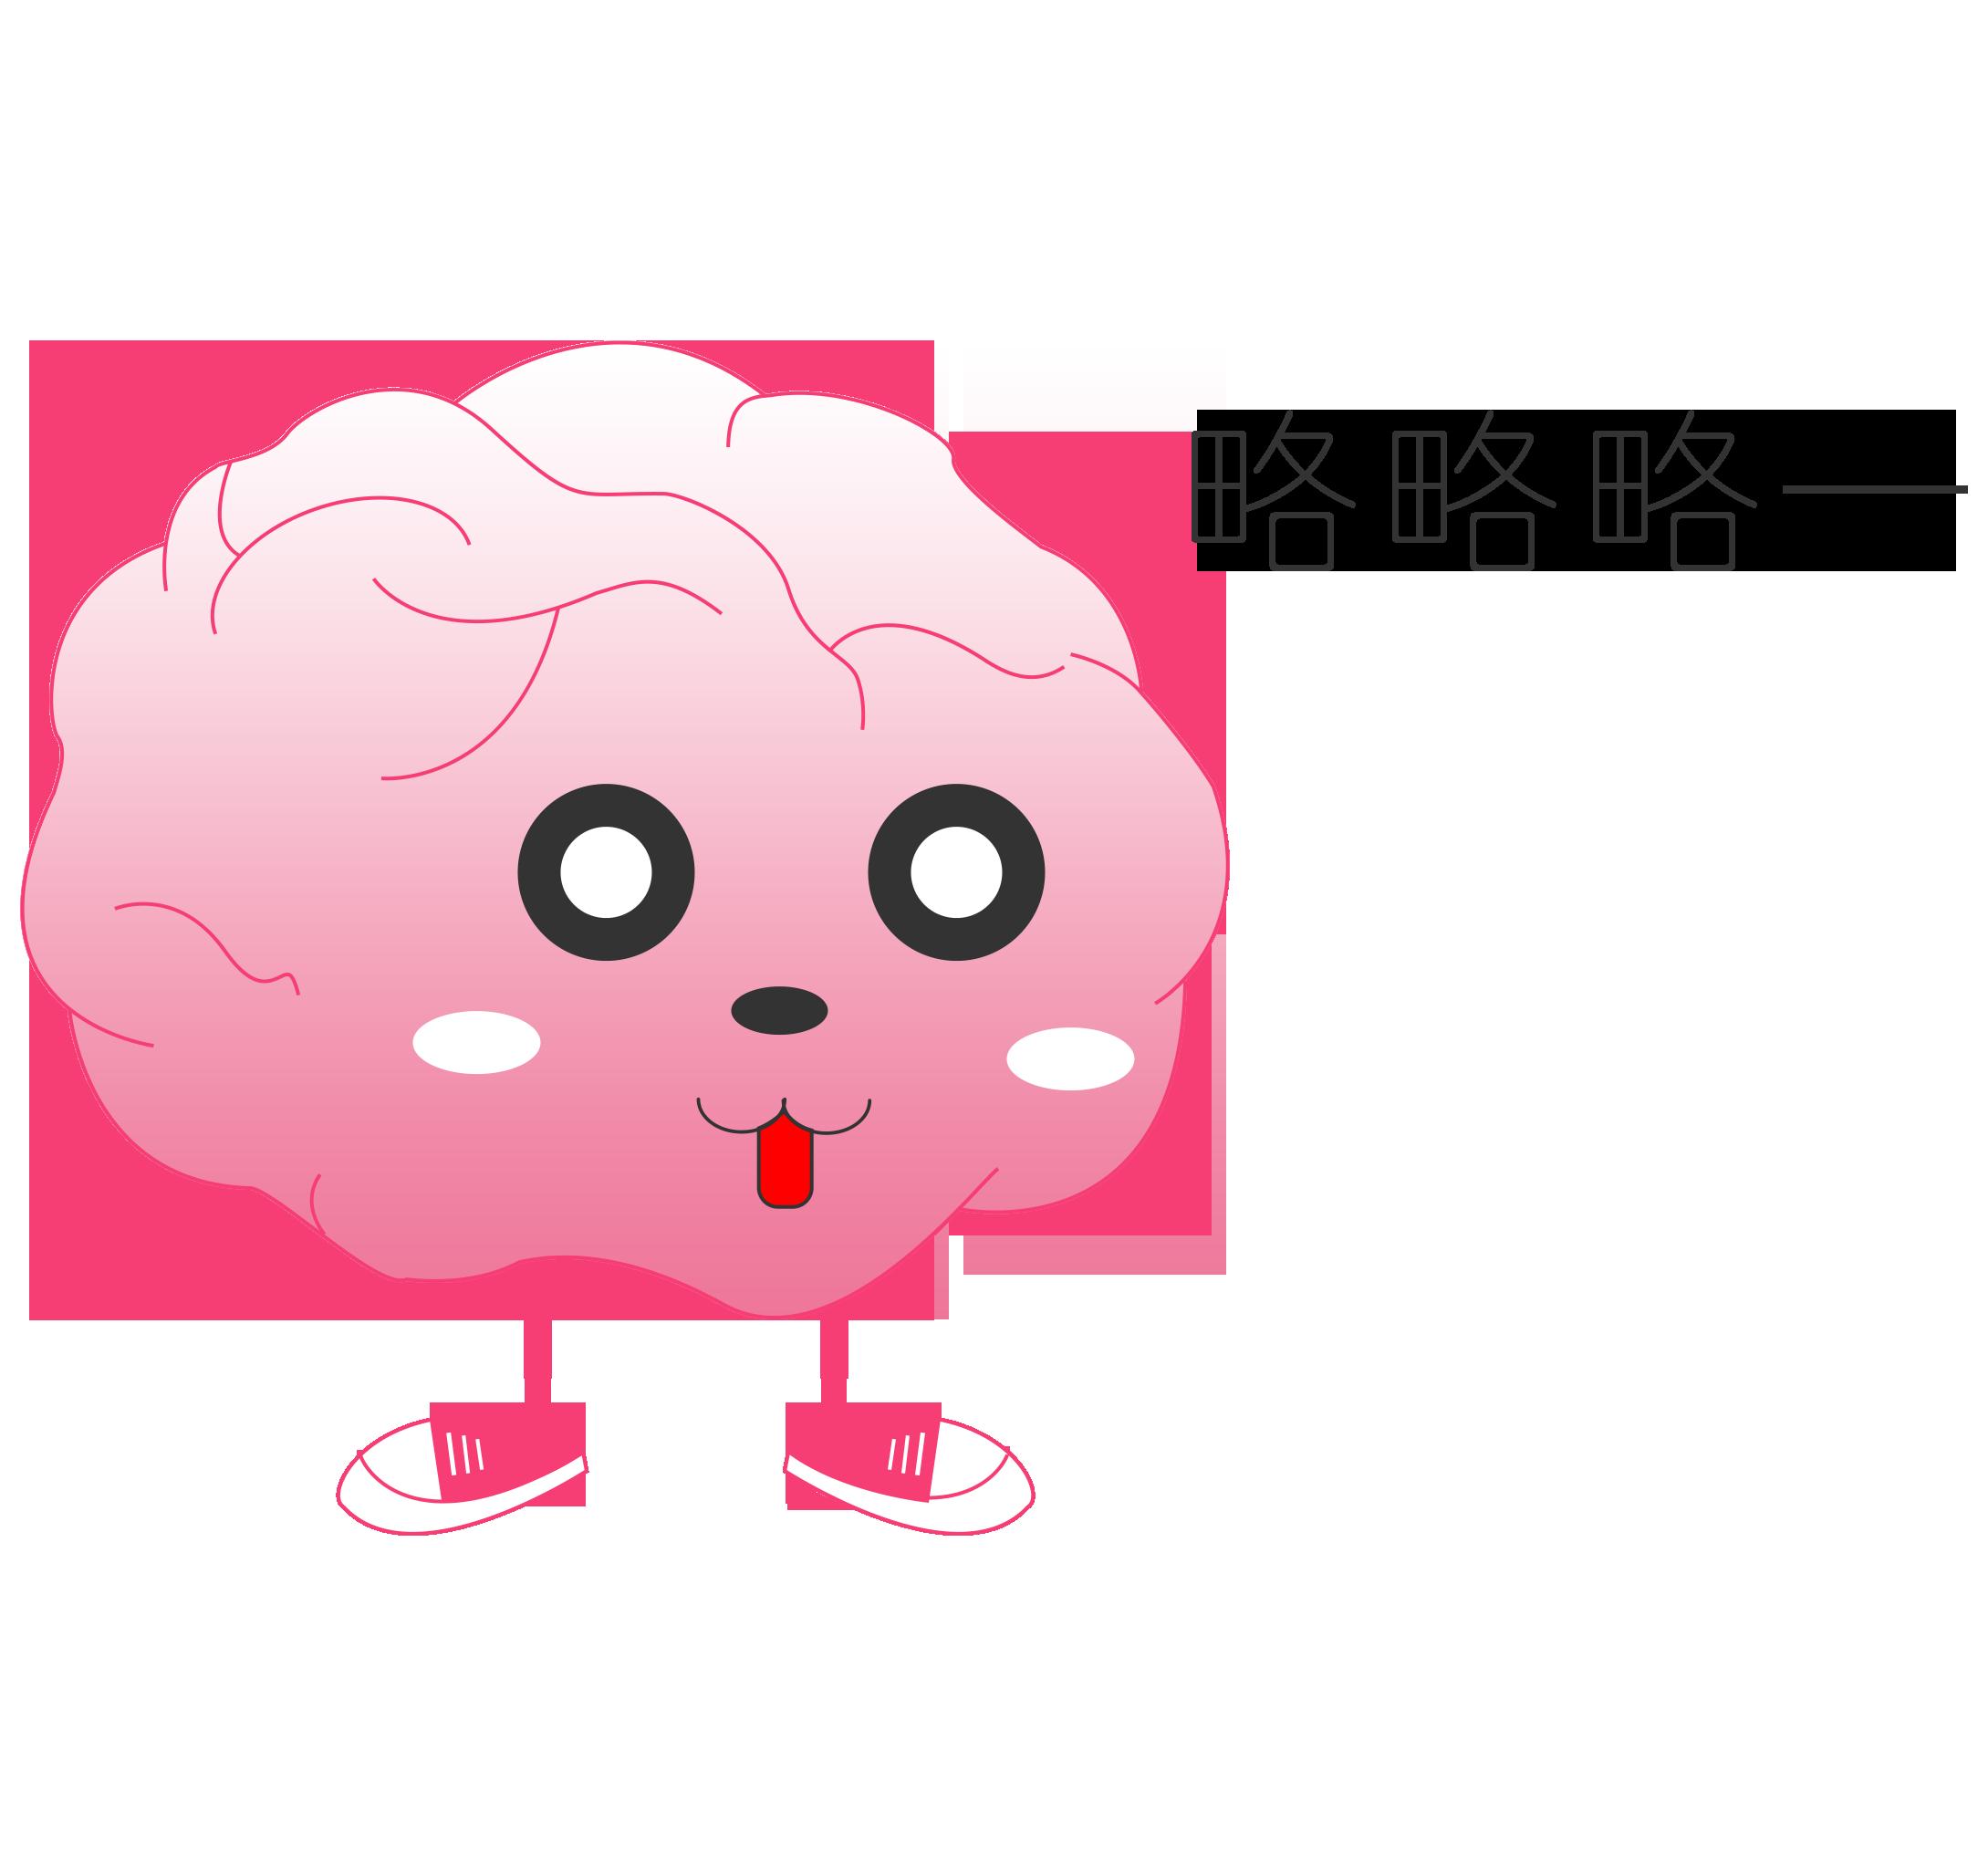 脑洞大师-Emoji样式贼多 messages sticker-4